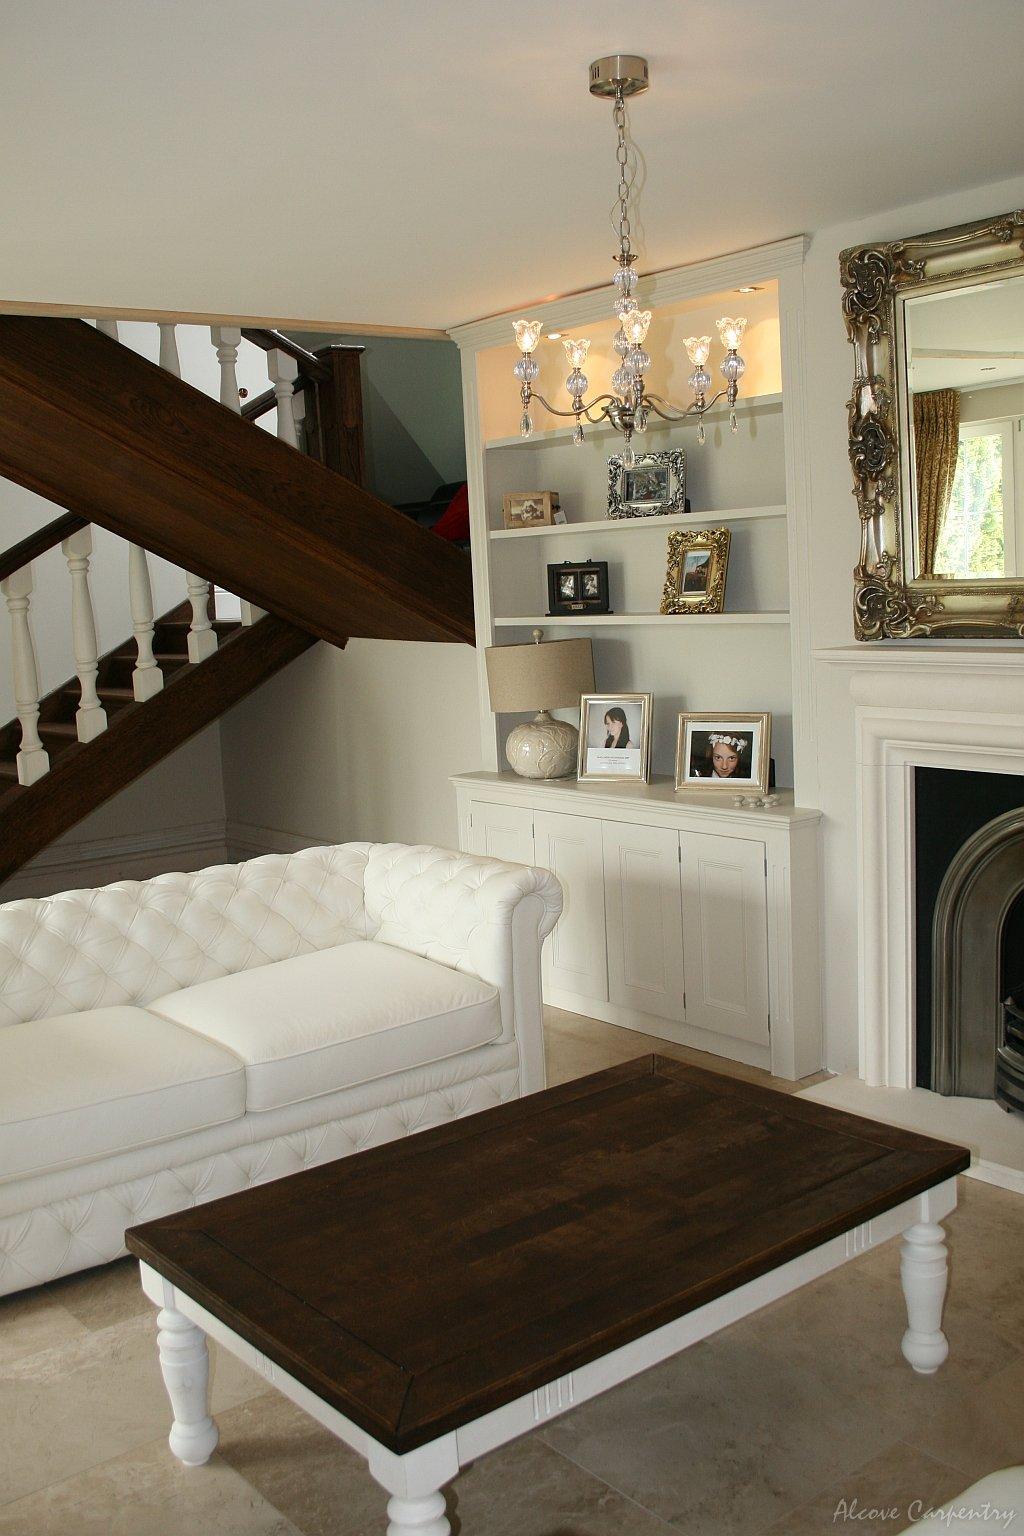 Affordable Interior Design Services